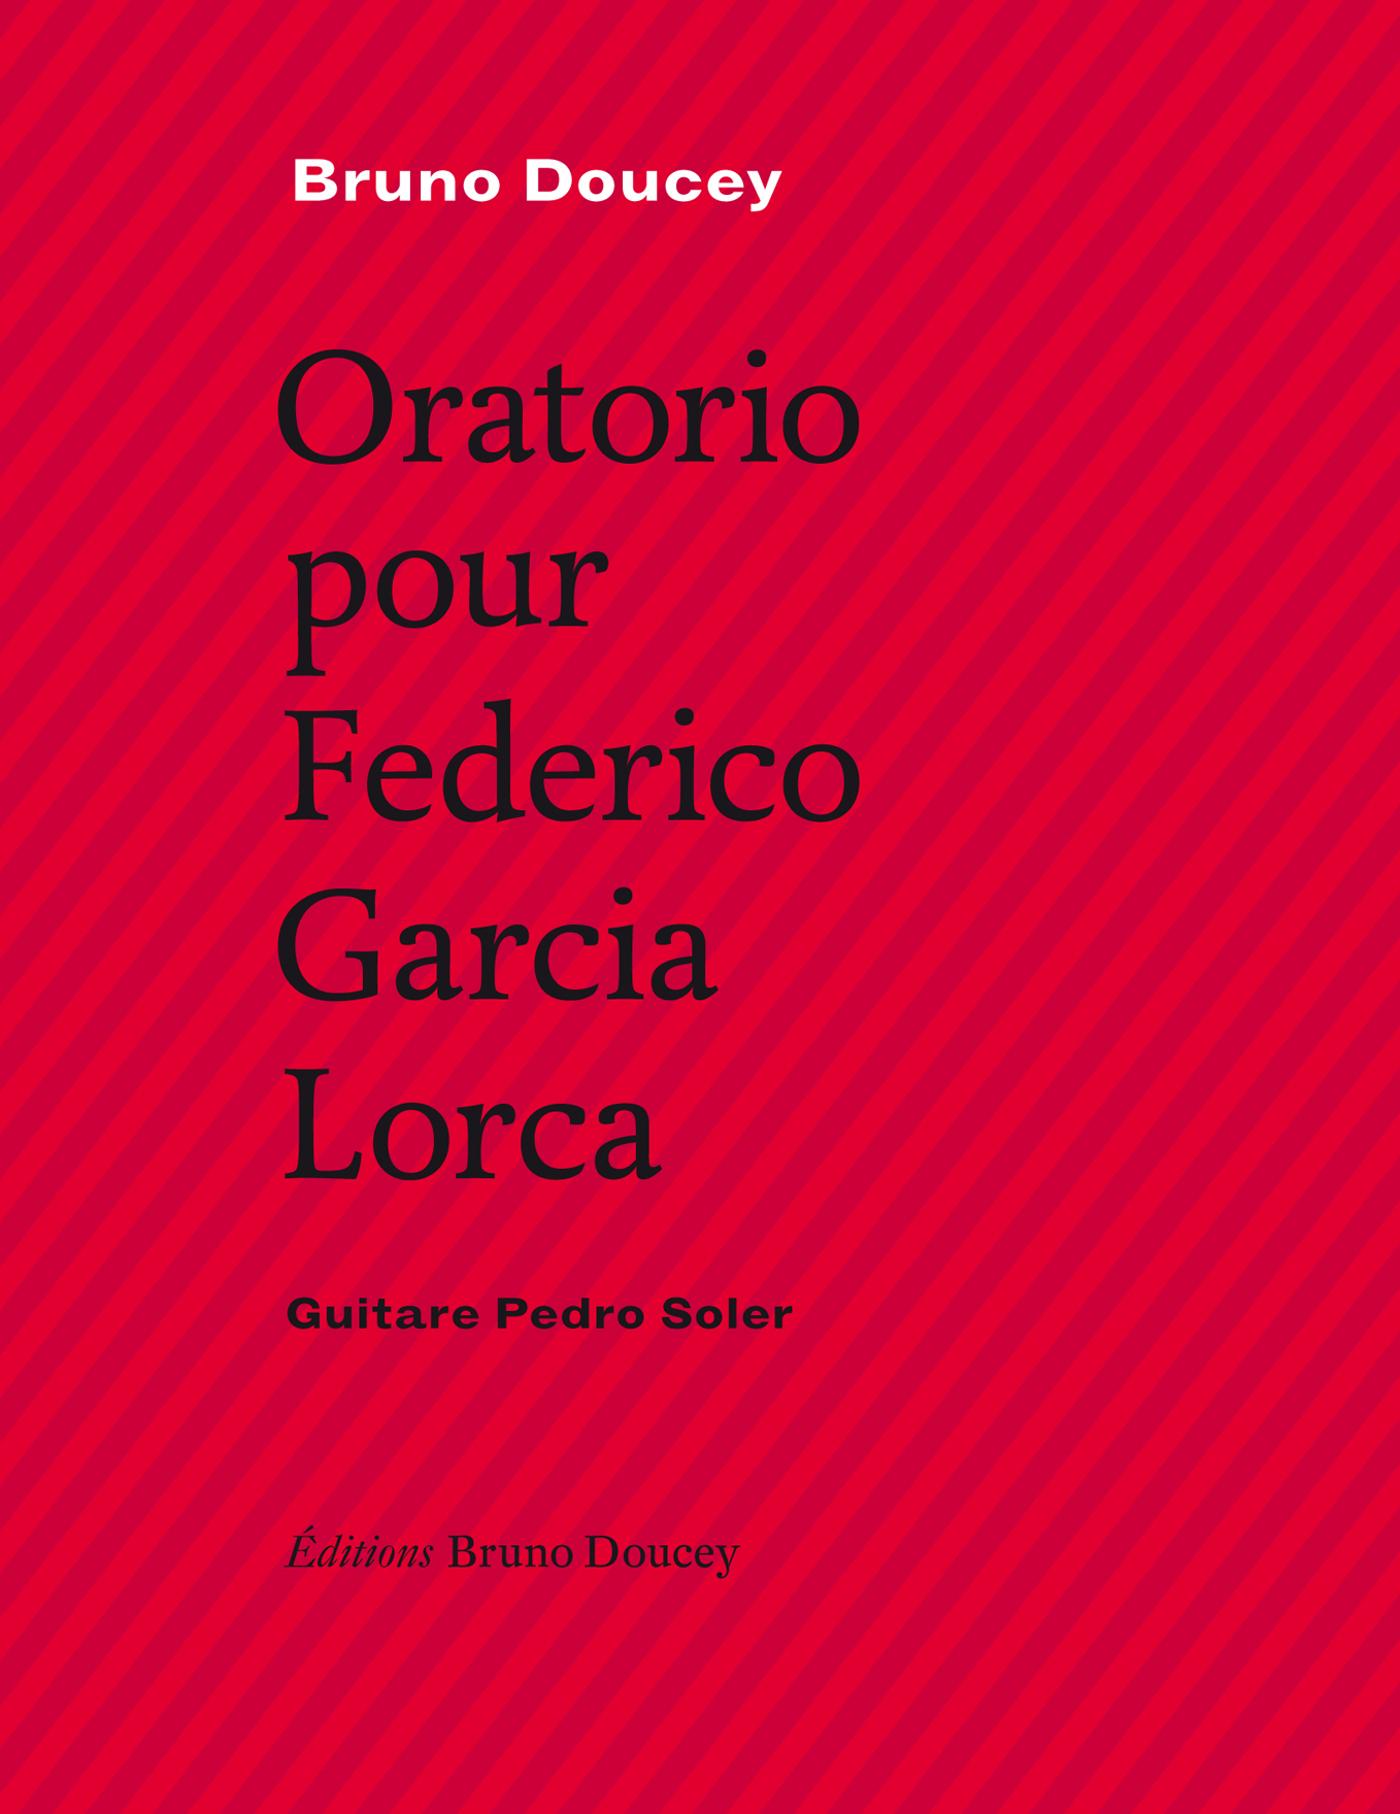 Oratorio pour Federico Garc...